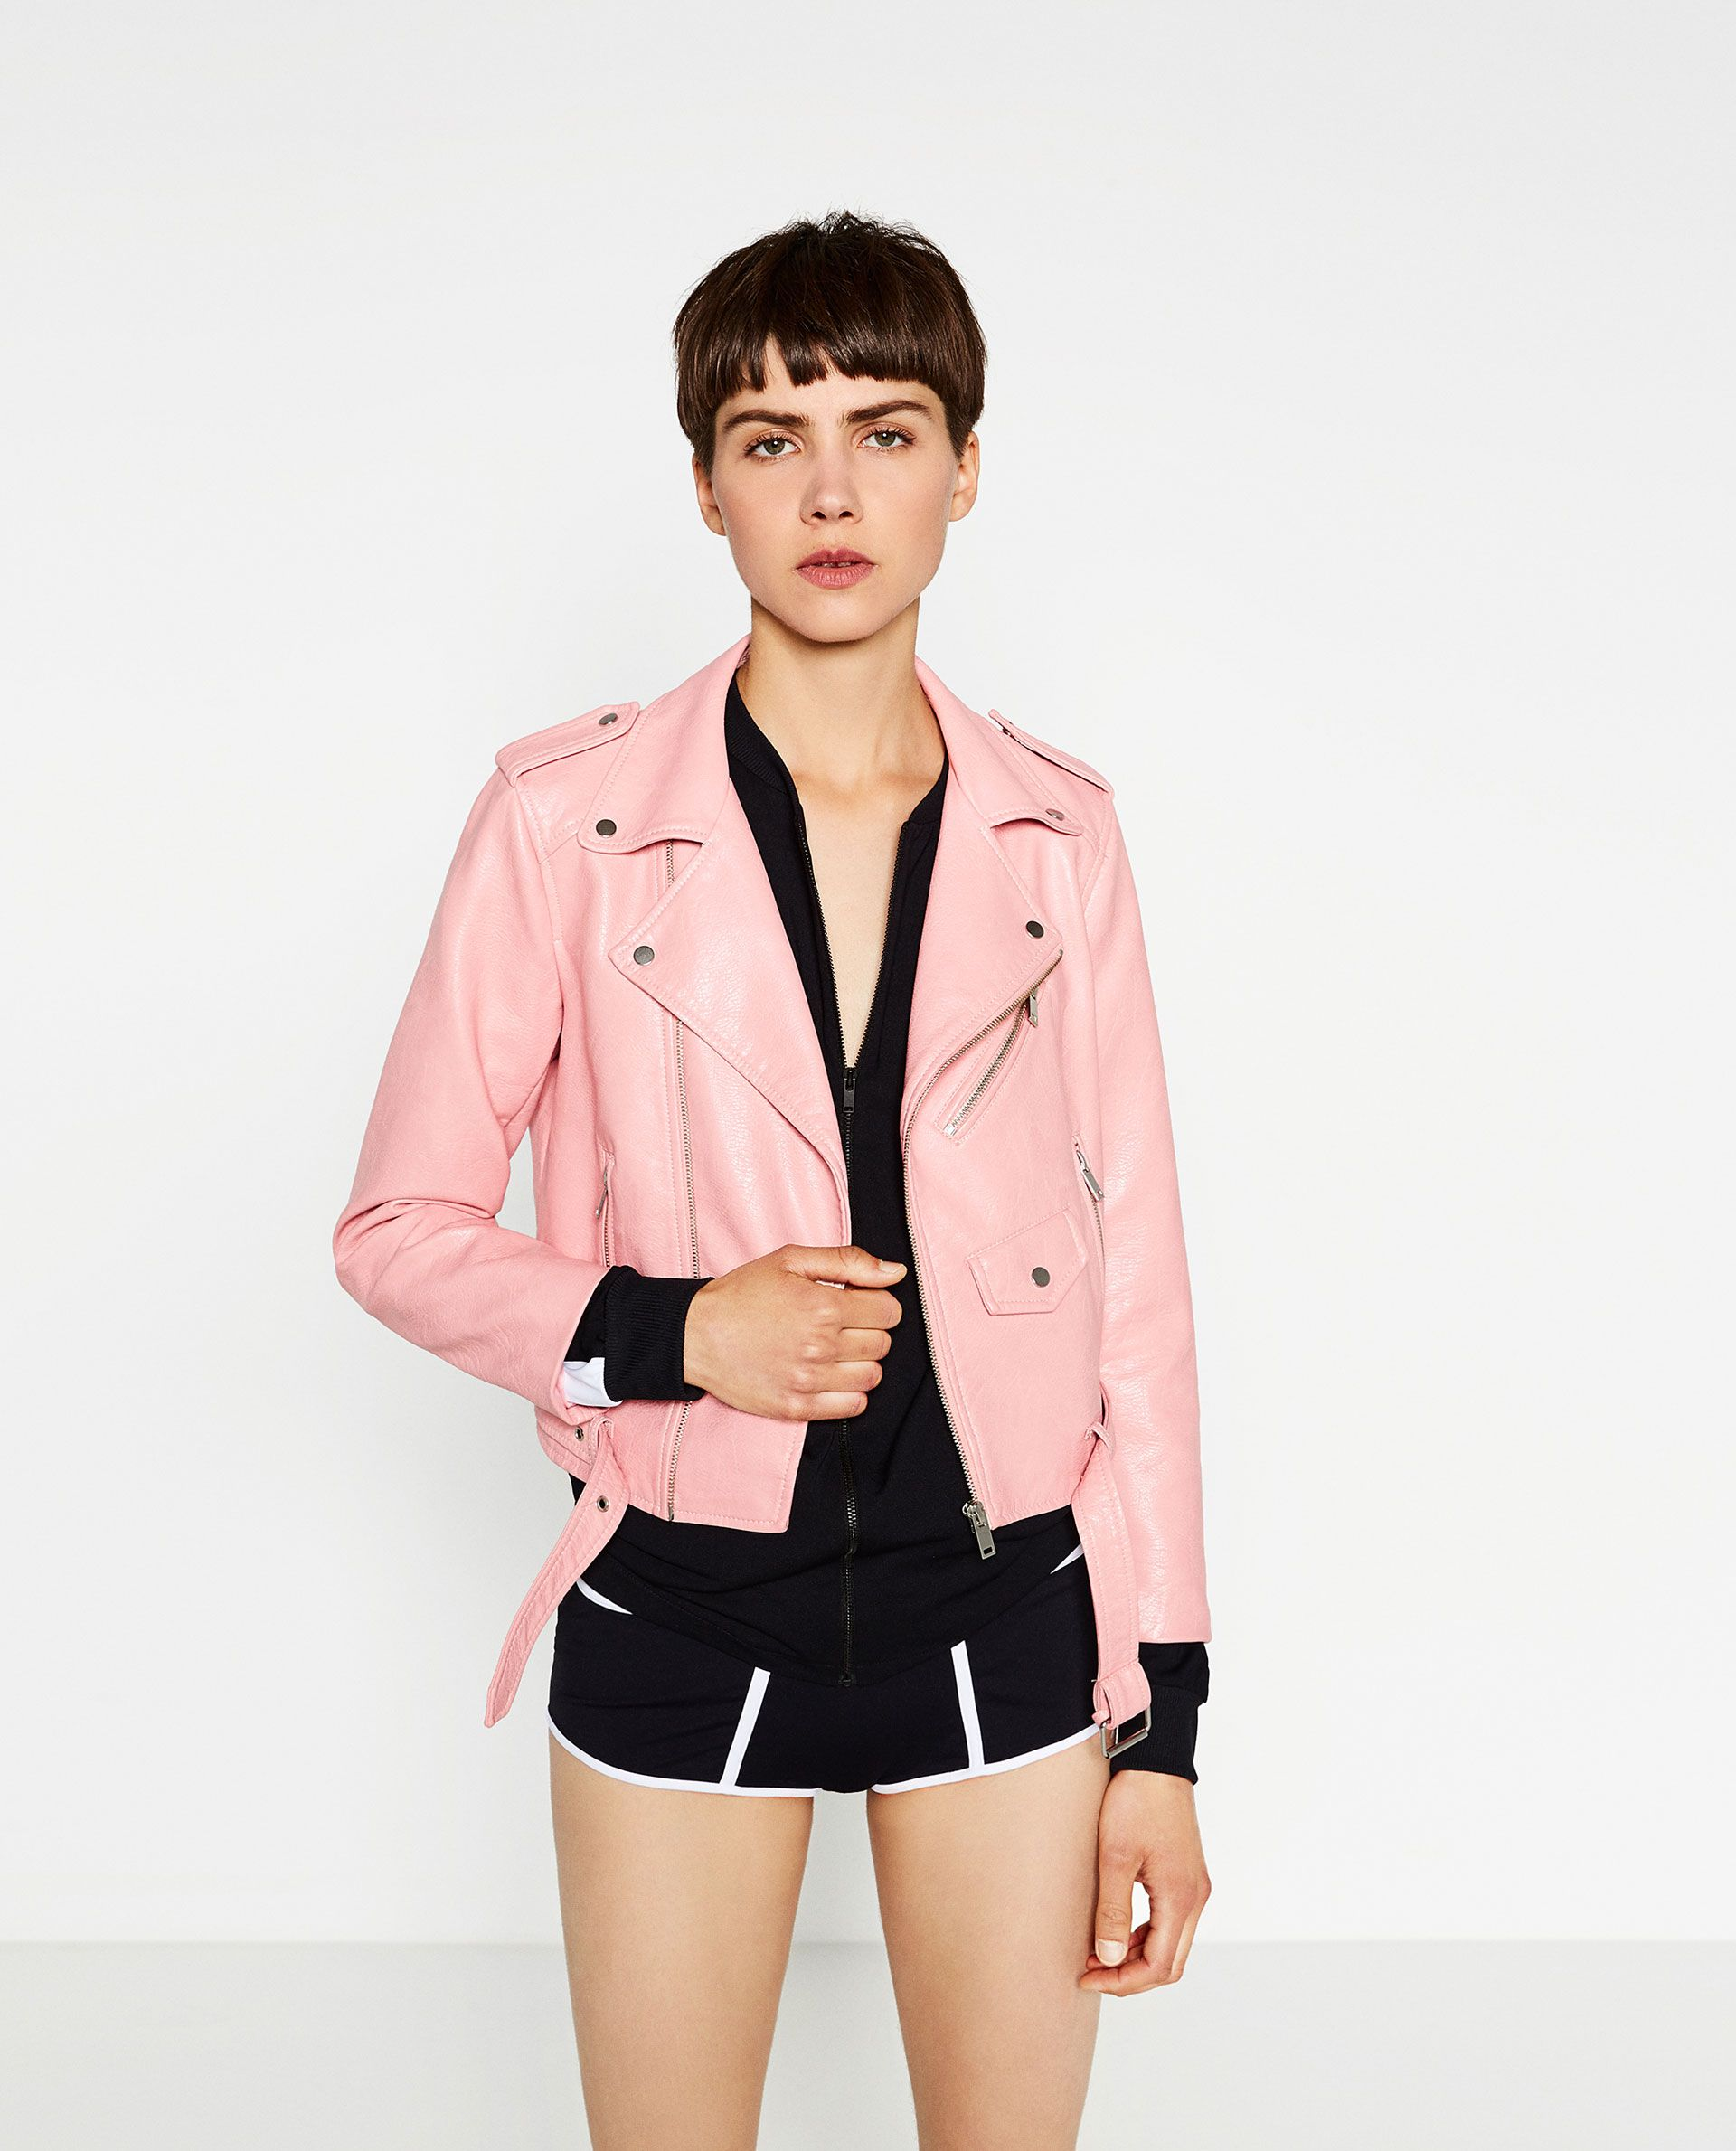 ZARA PINK FAUX LEATHER JACKET Pink leather moto jacket